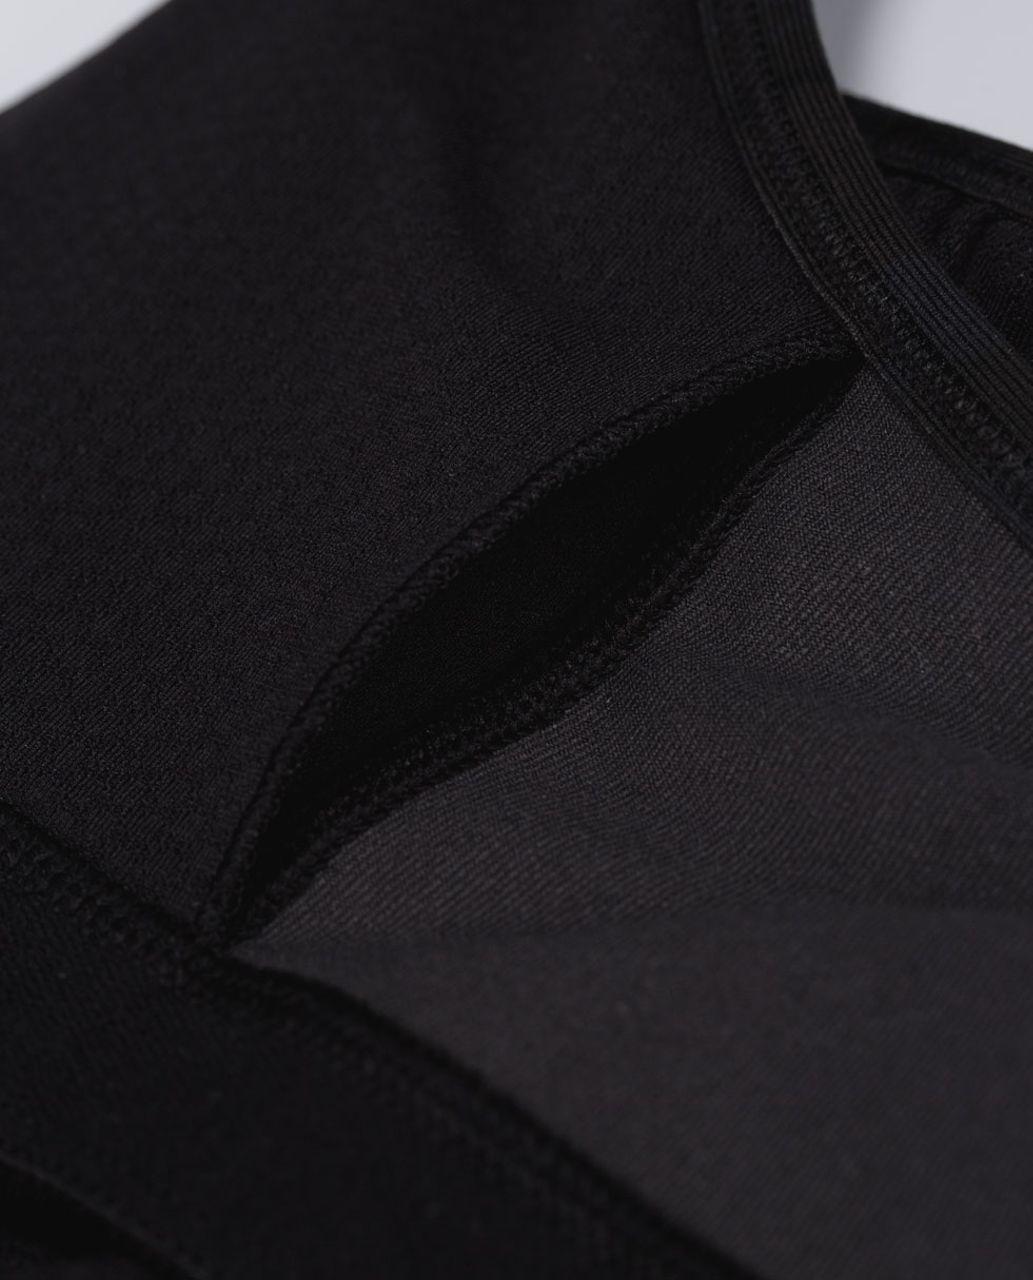 Lululemon No Limits Tank - Black / Savasana Camo 20cm New Black